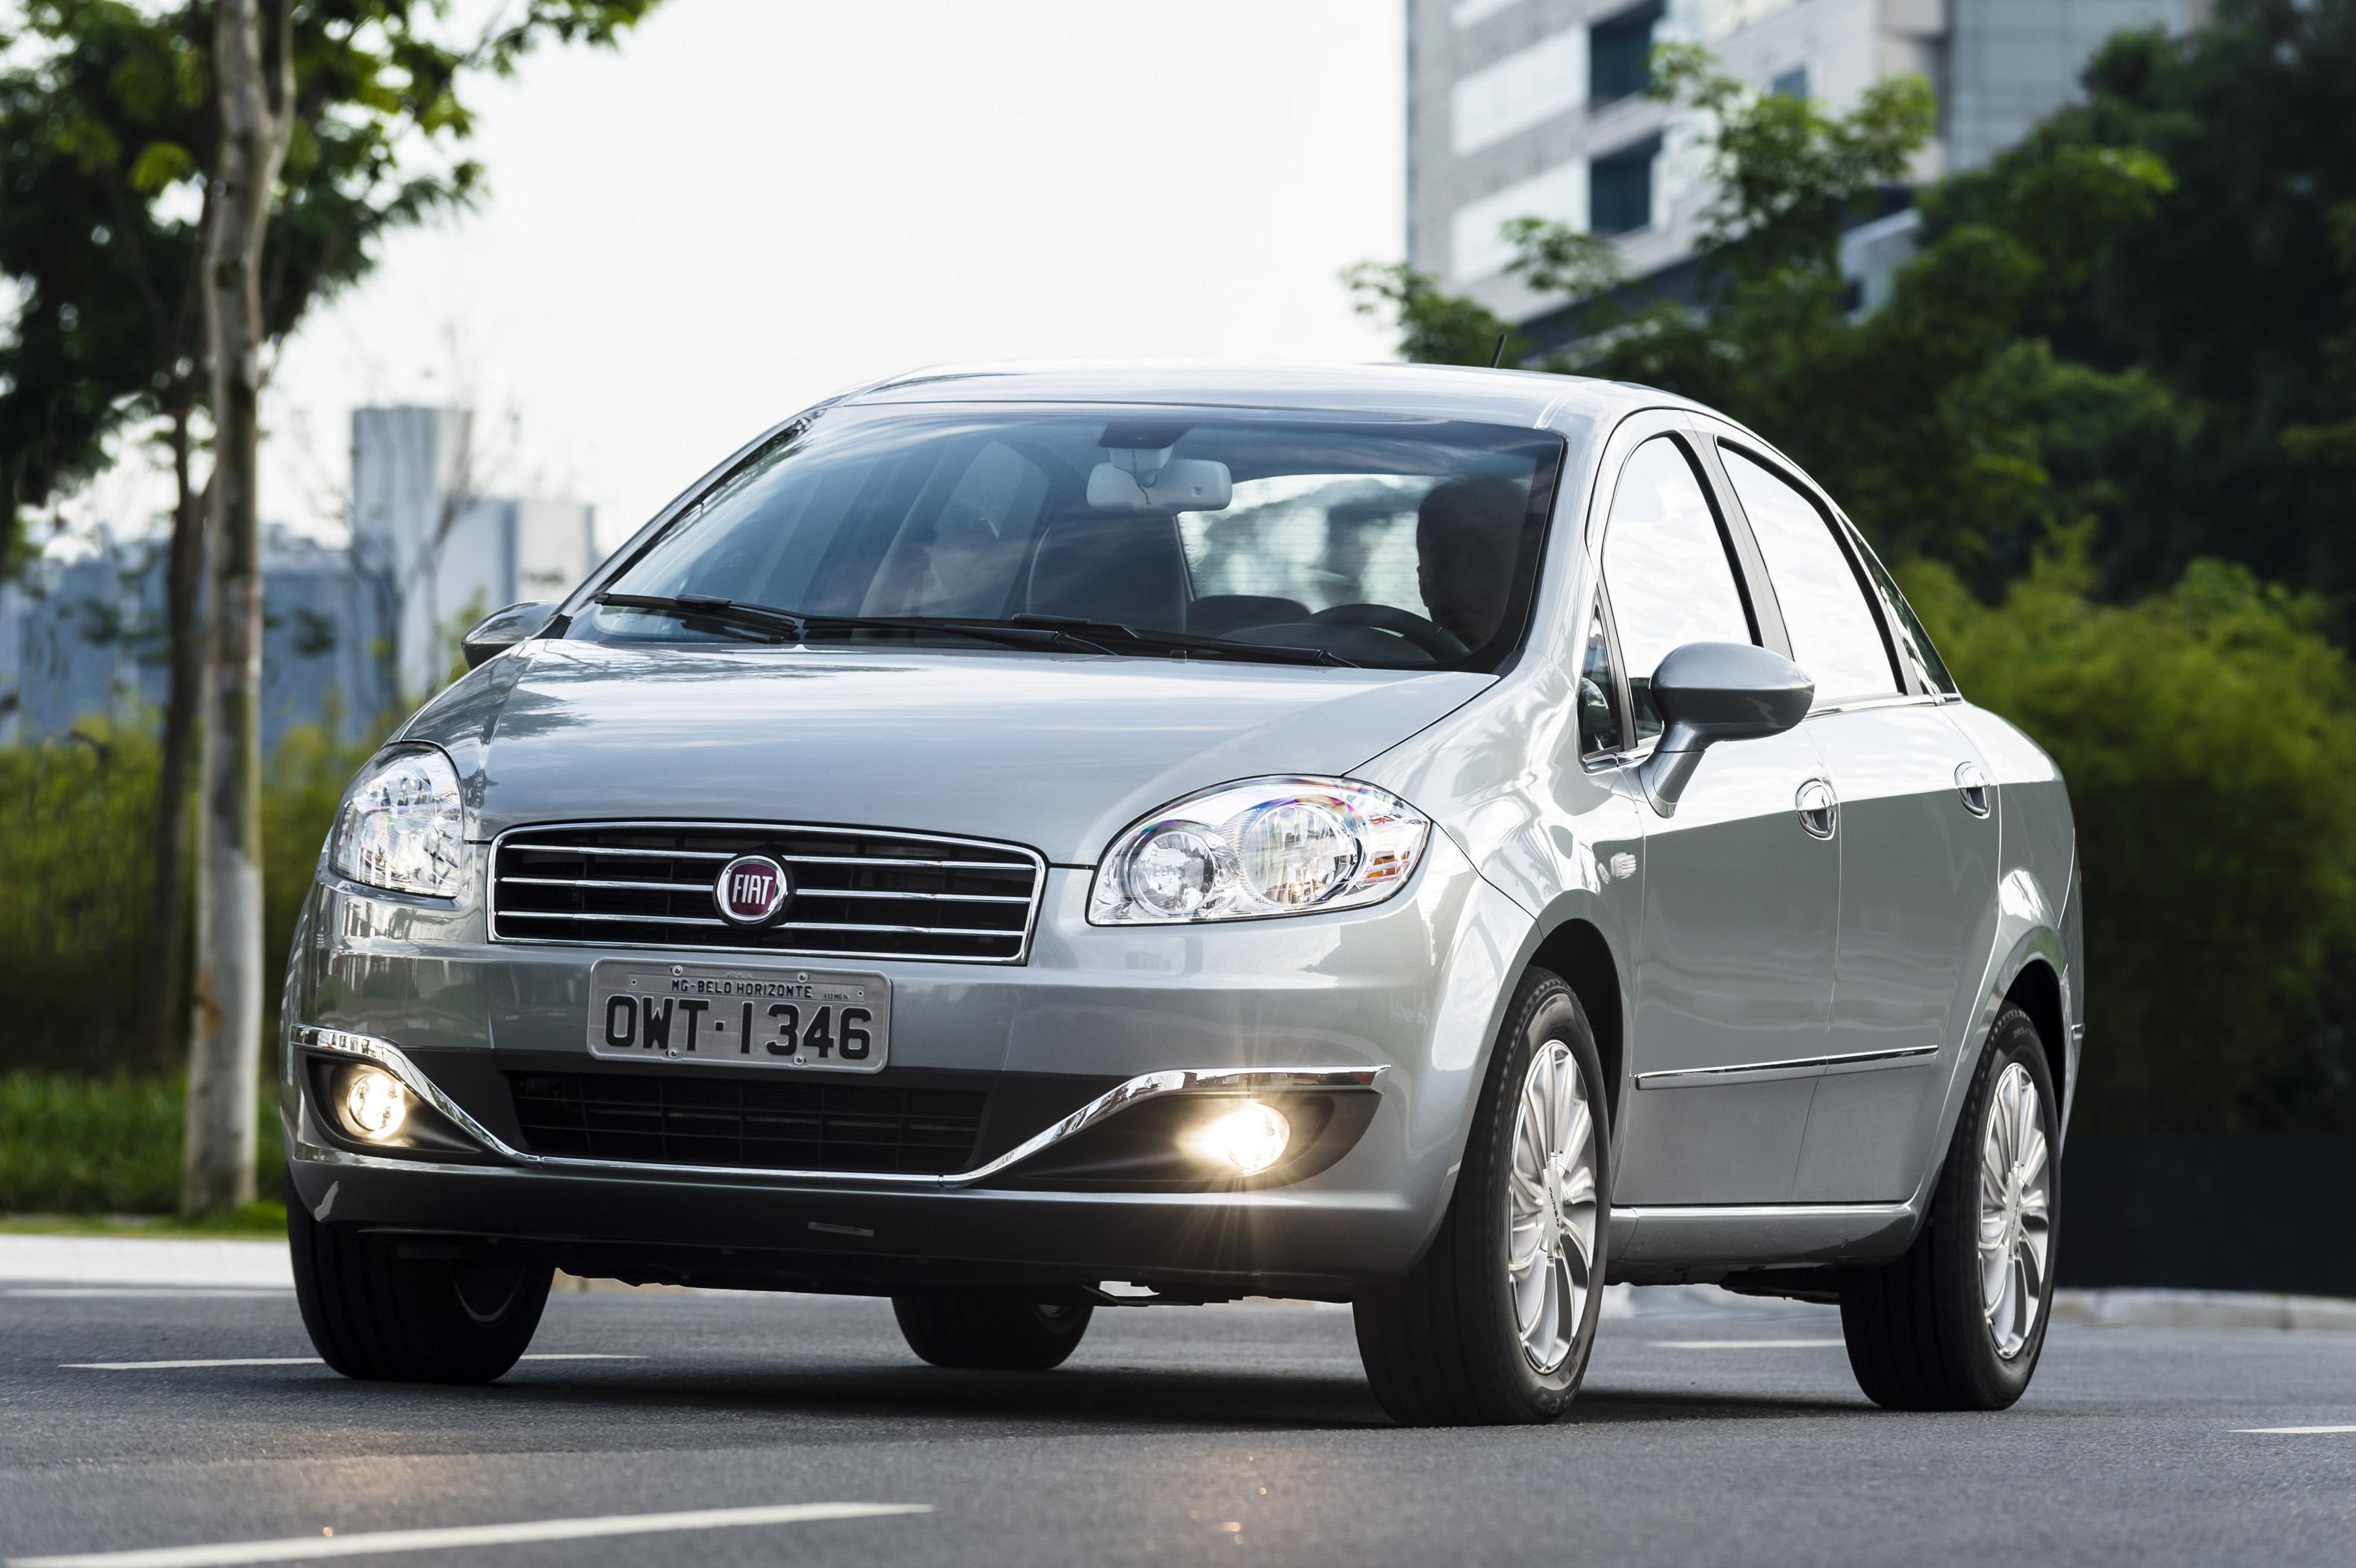 Satılık 2014 model Fiat Linea